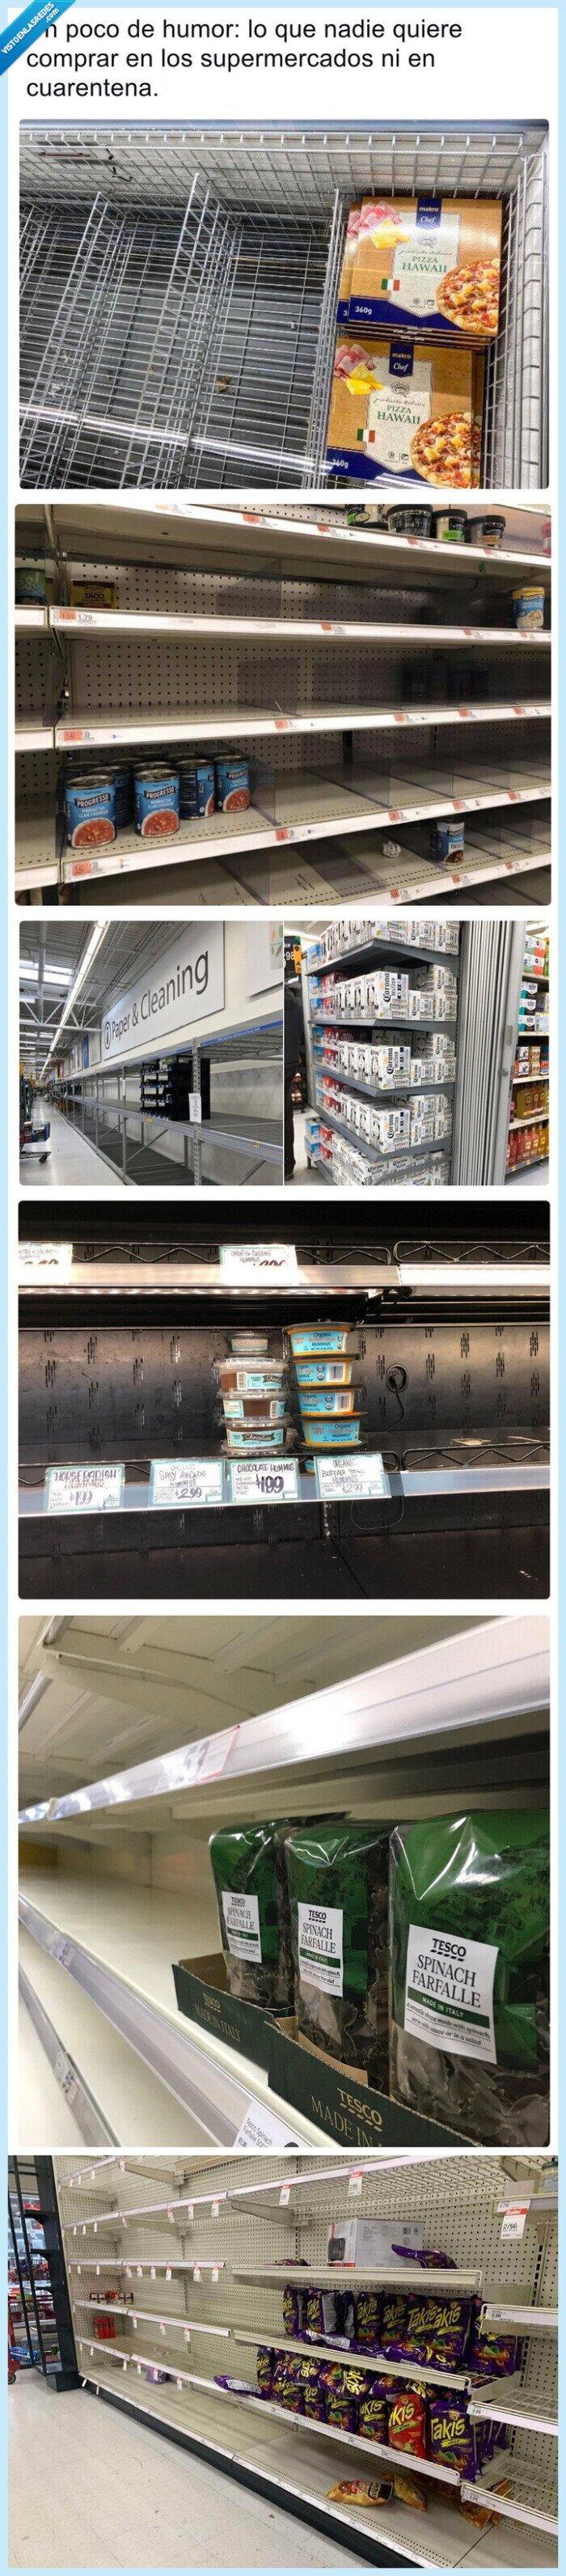 comida,coronavirus,cuarentena,ni con un palo,productos,supermercado